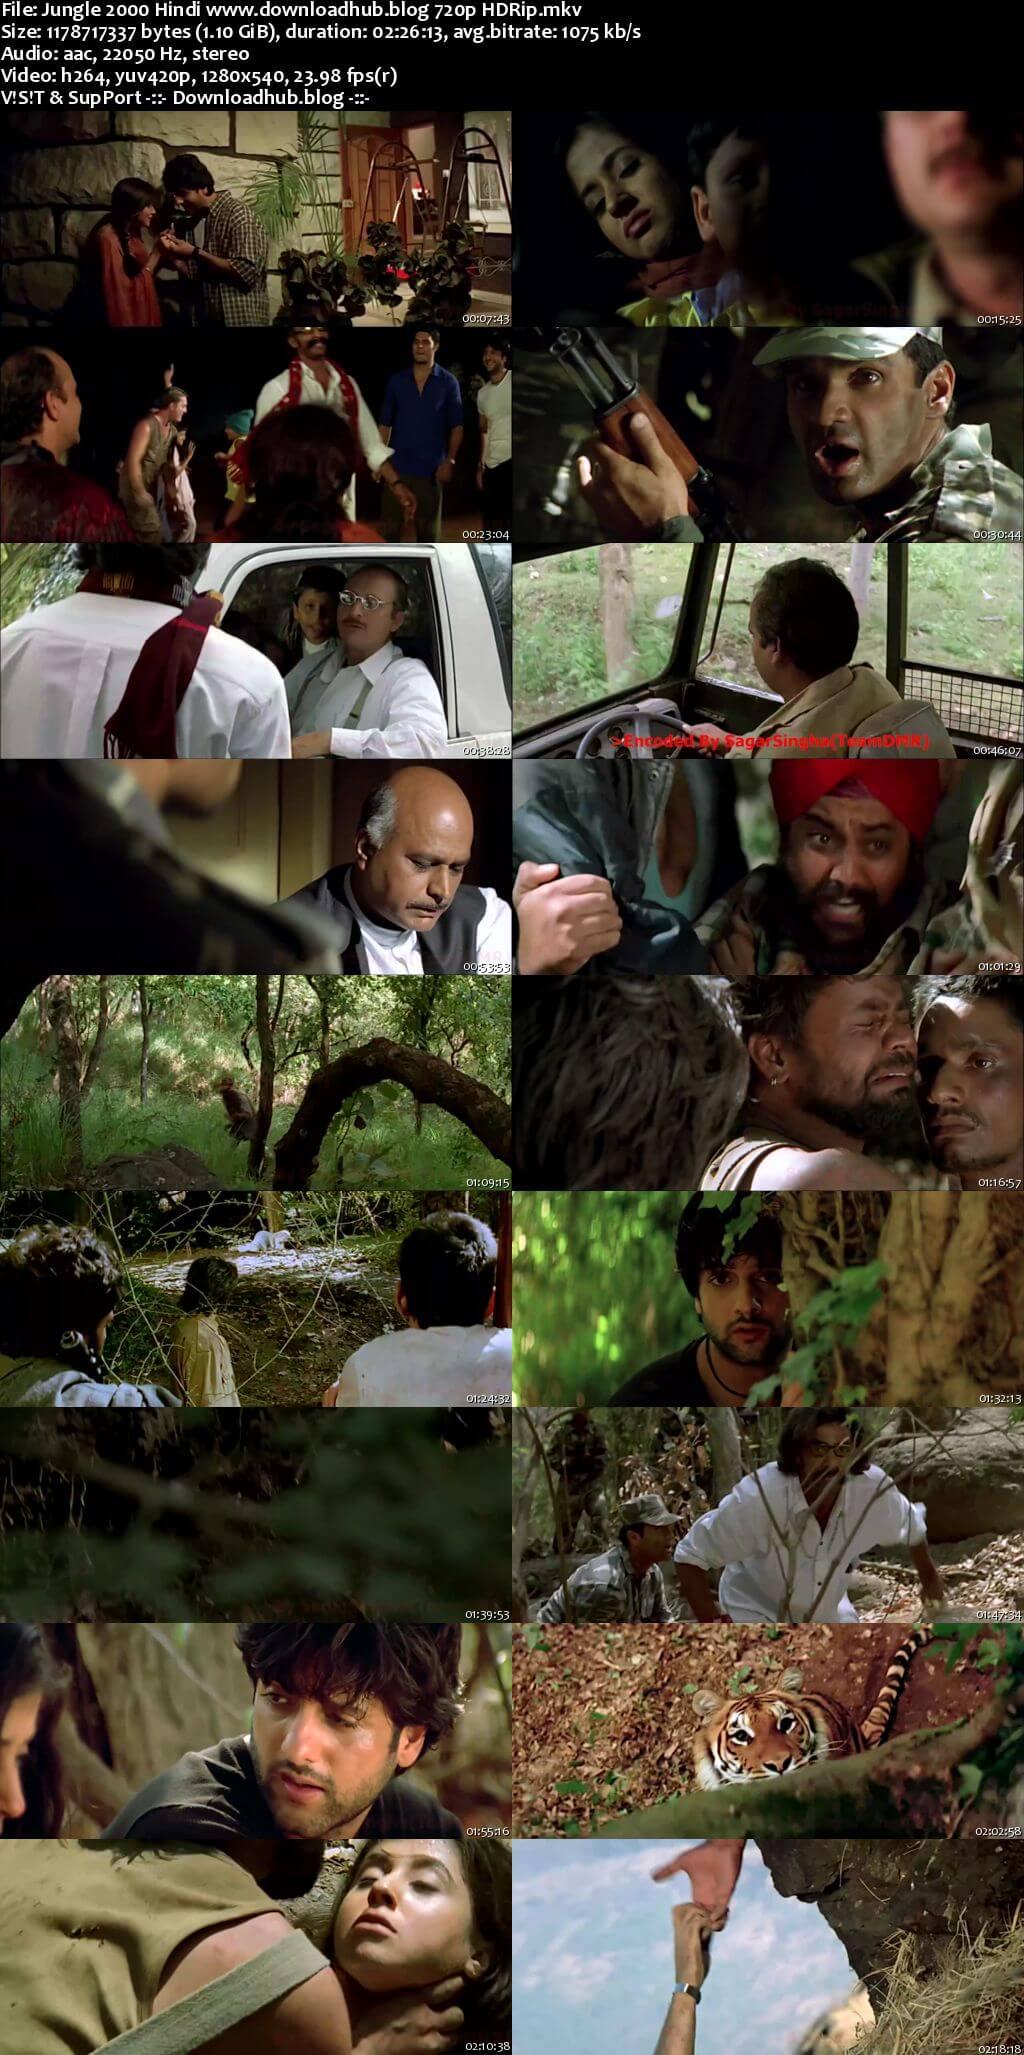 Jungle 2000 Hindi 720p HDRip x264